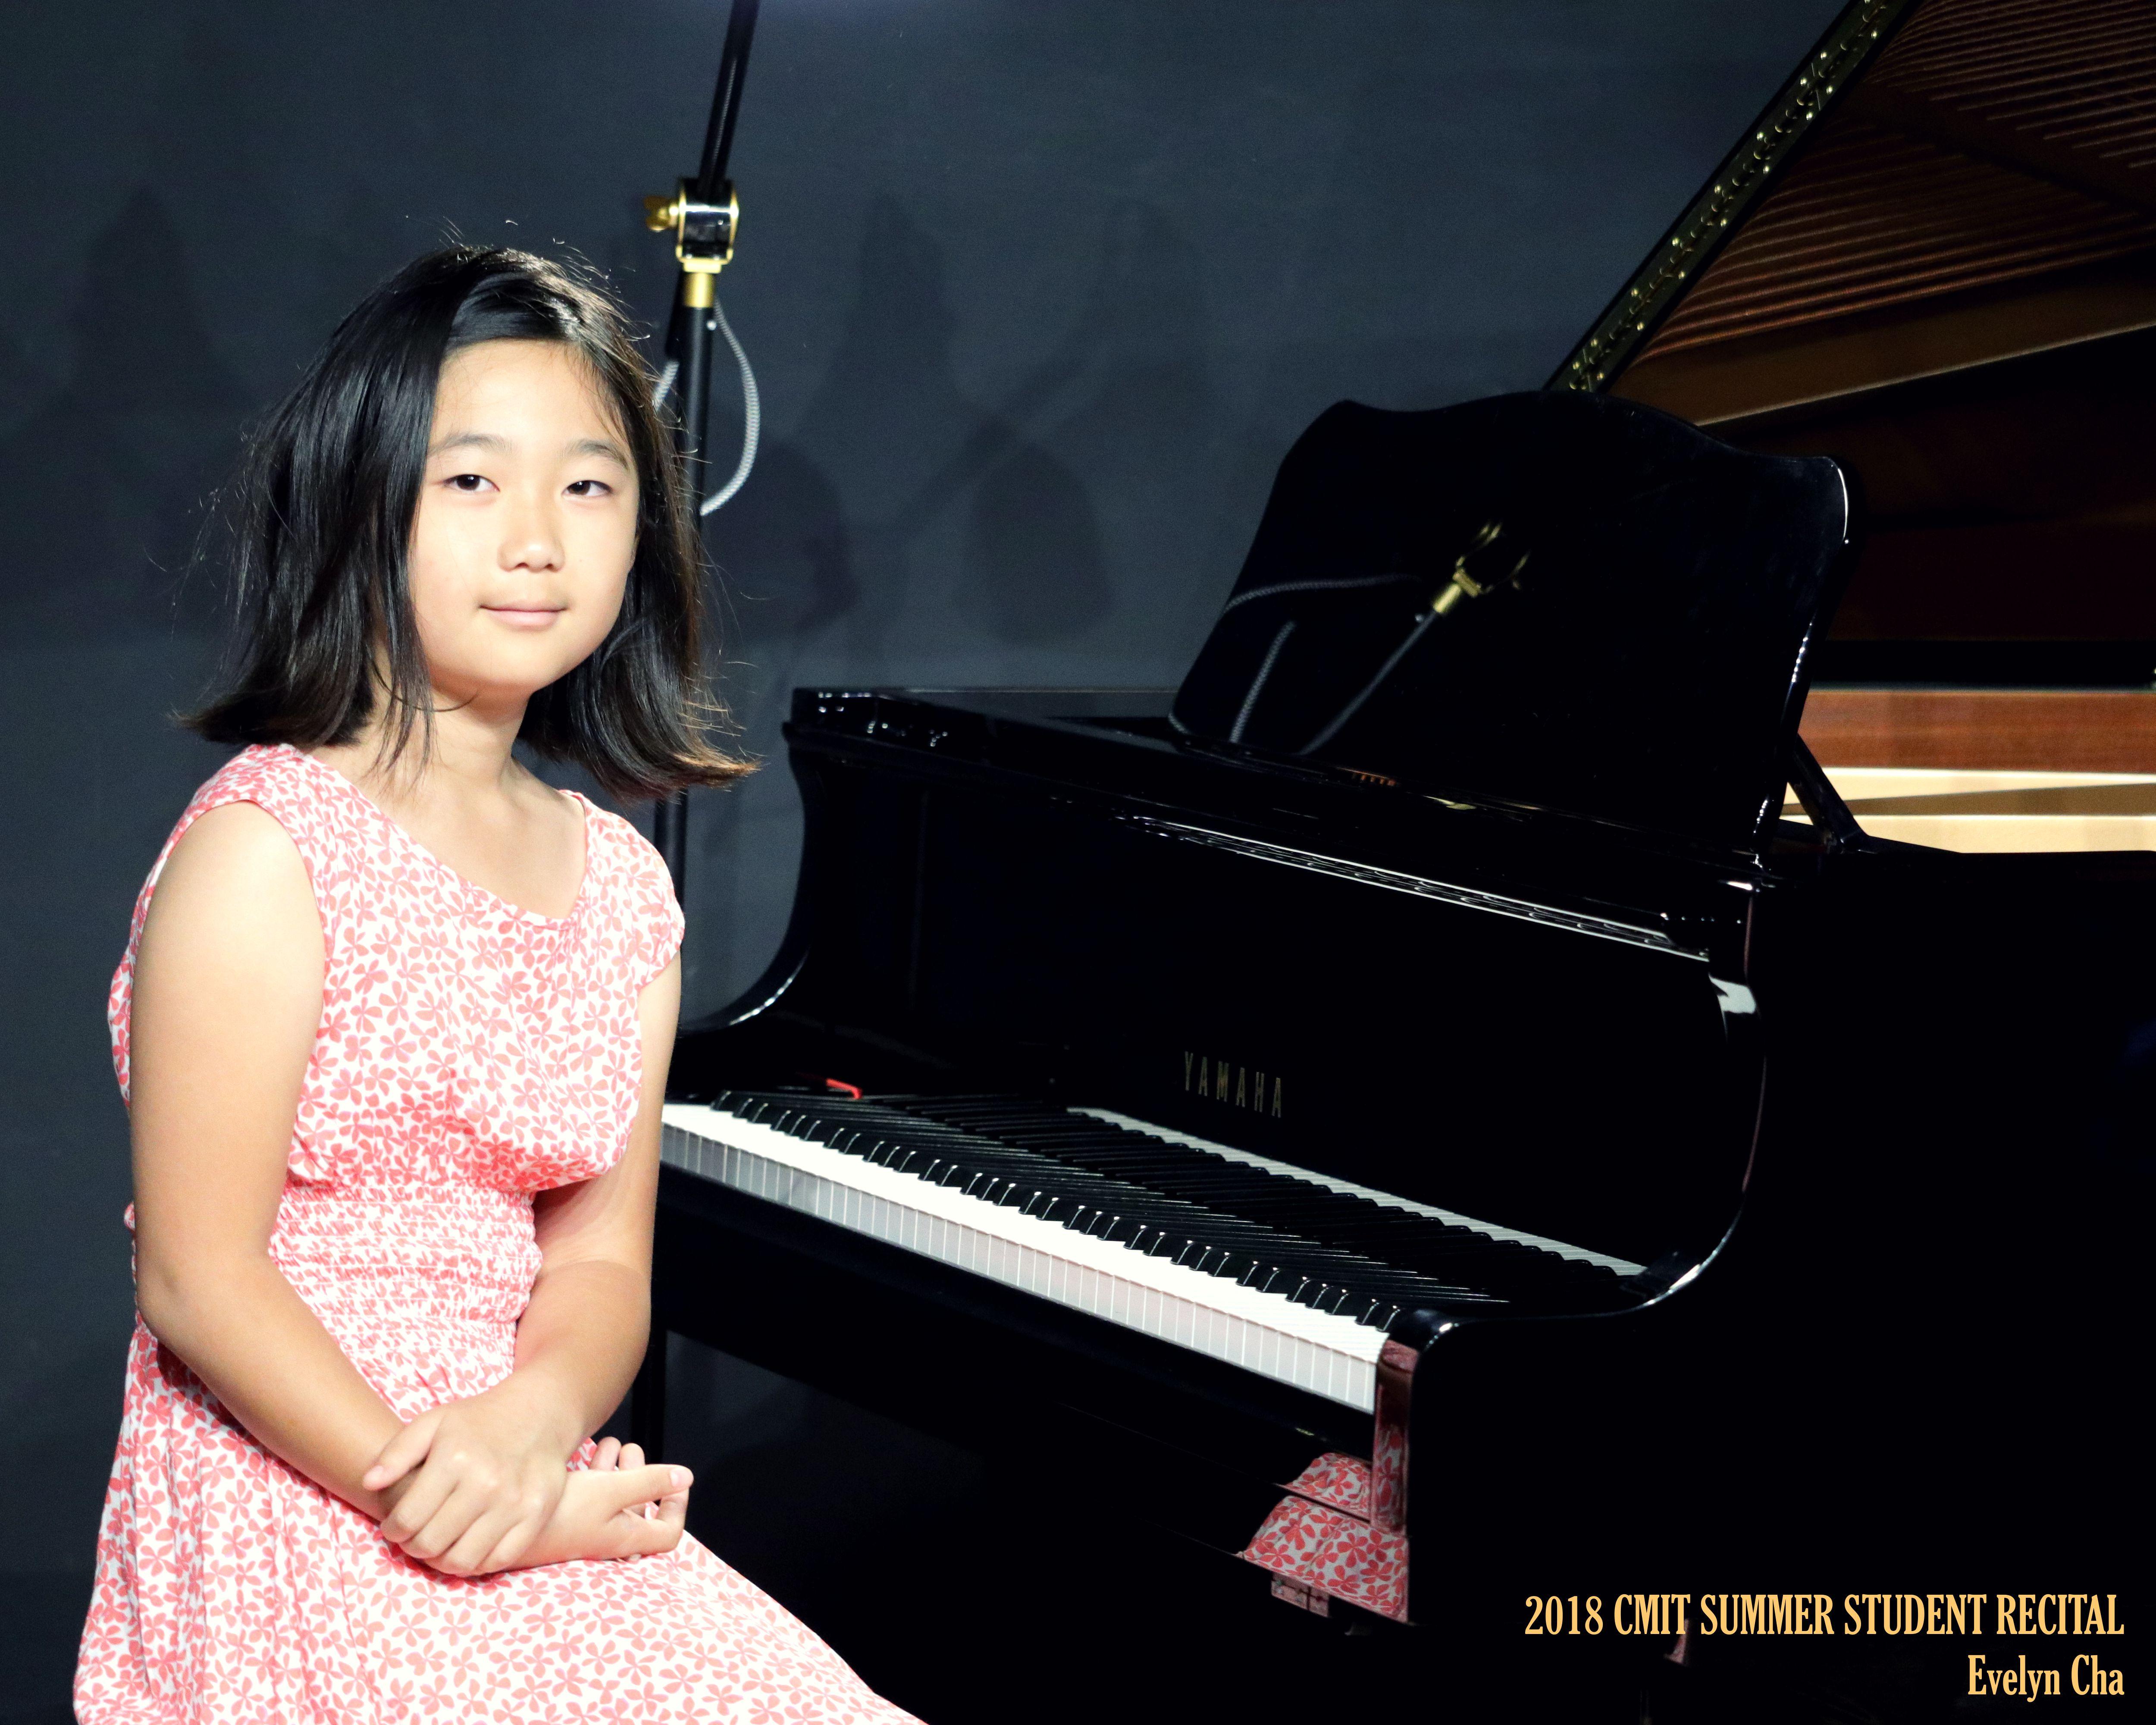 09 Evelyn Cha